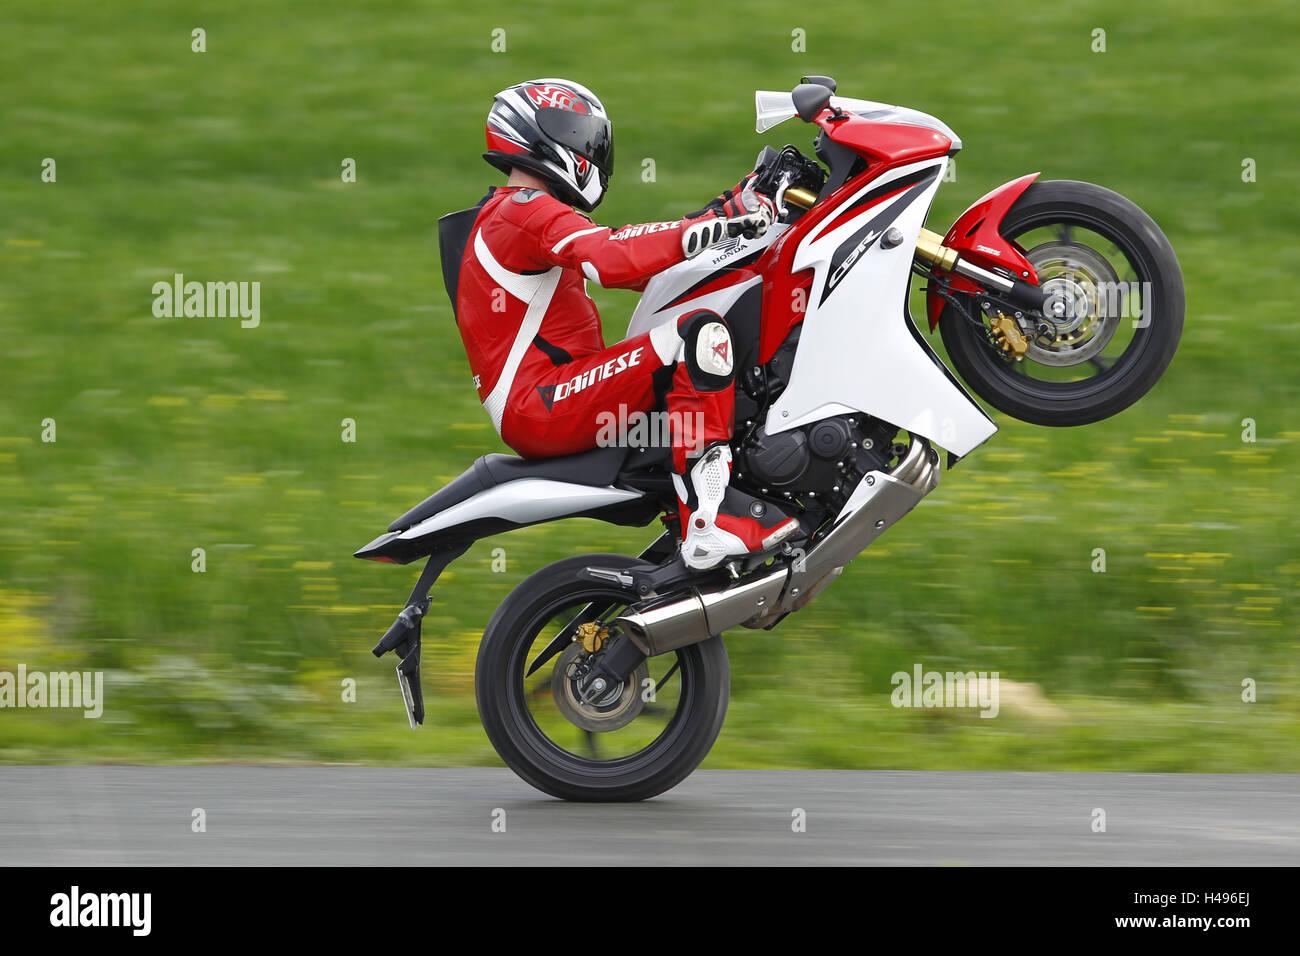 Motorcycle, Honda CBR 600 F, moving, Wheelie, panning, - Stock Image